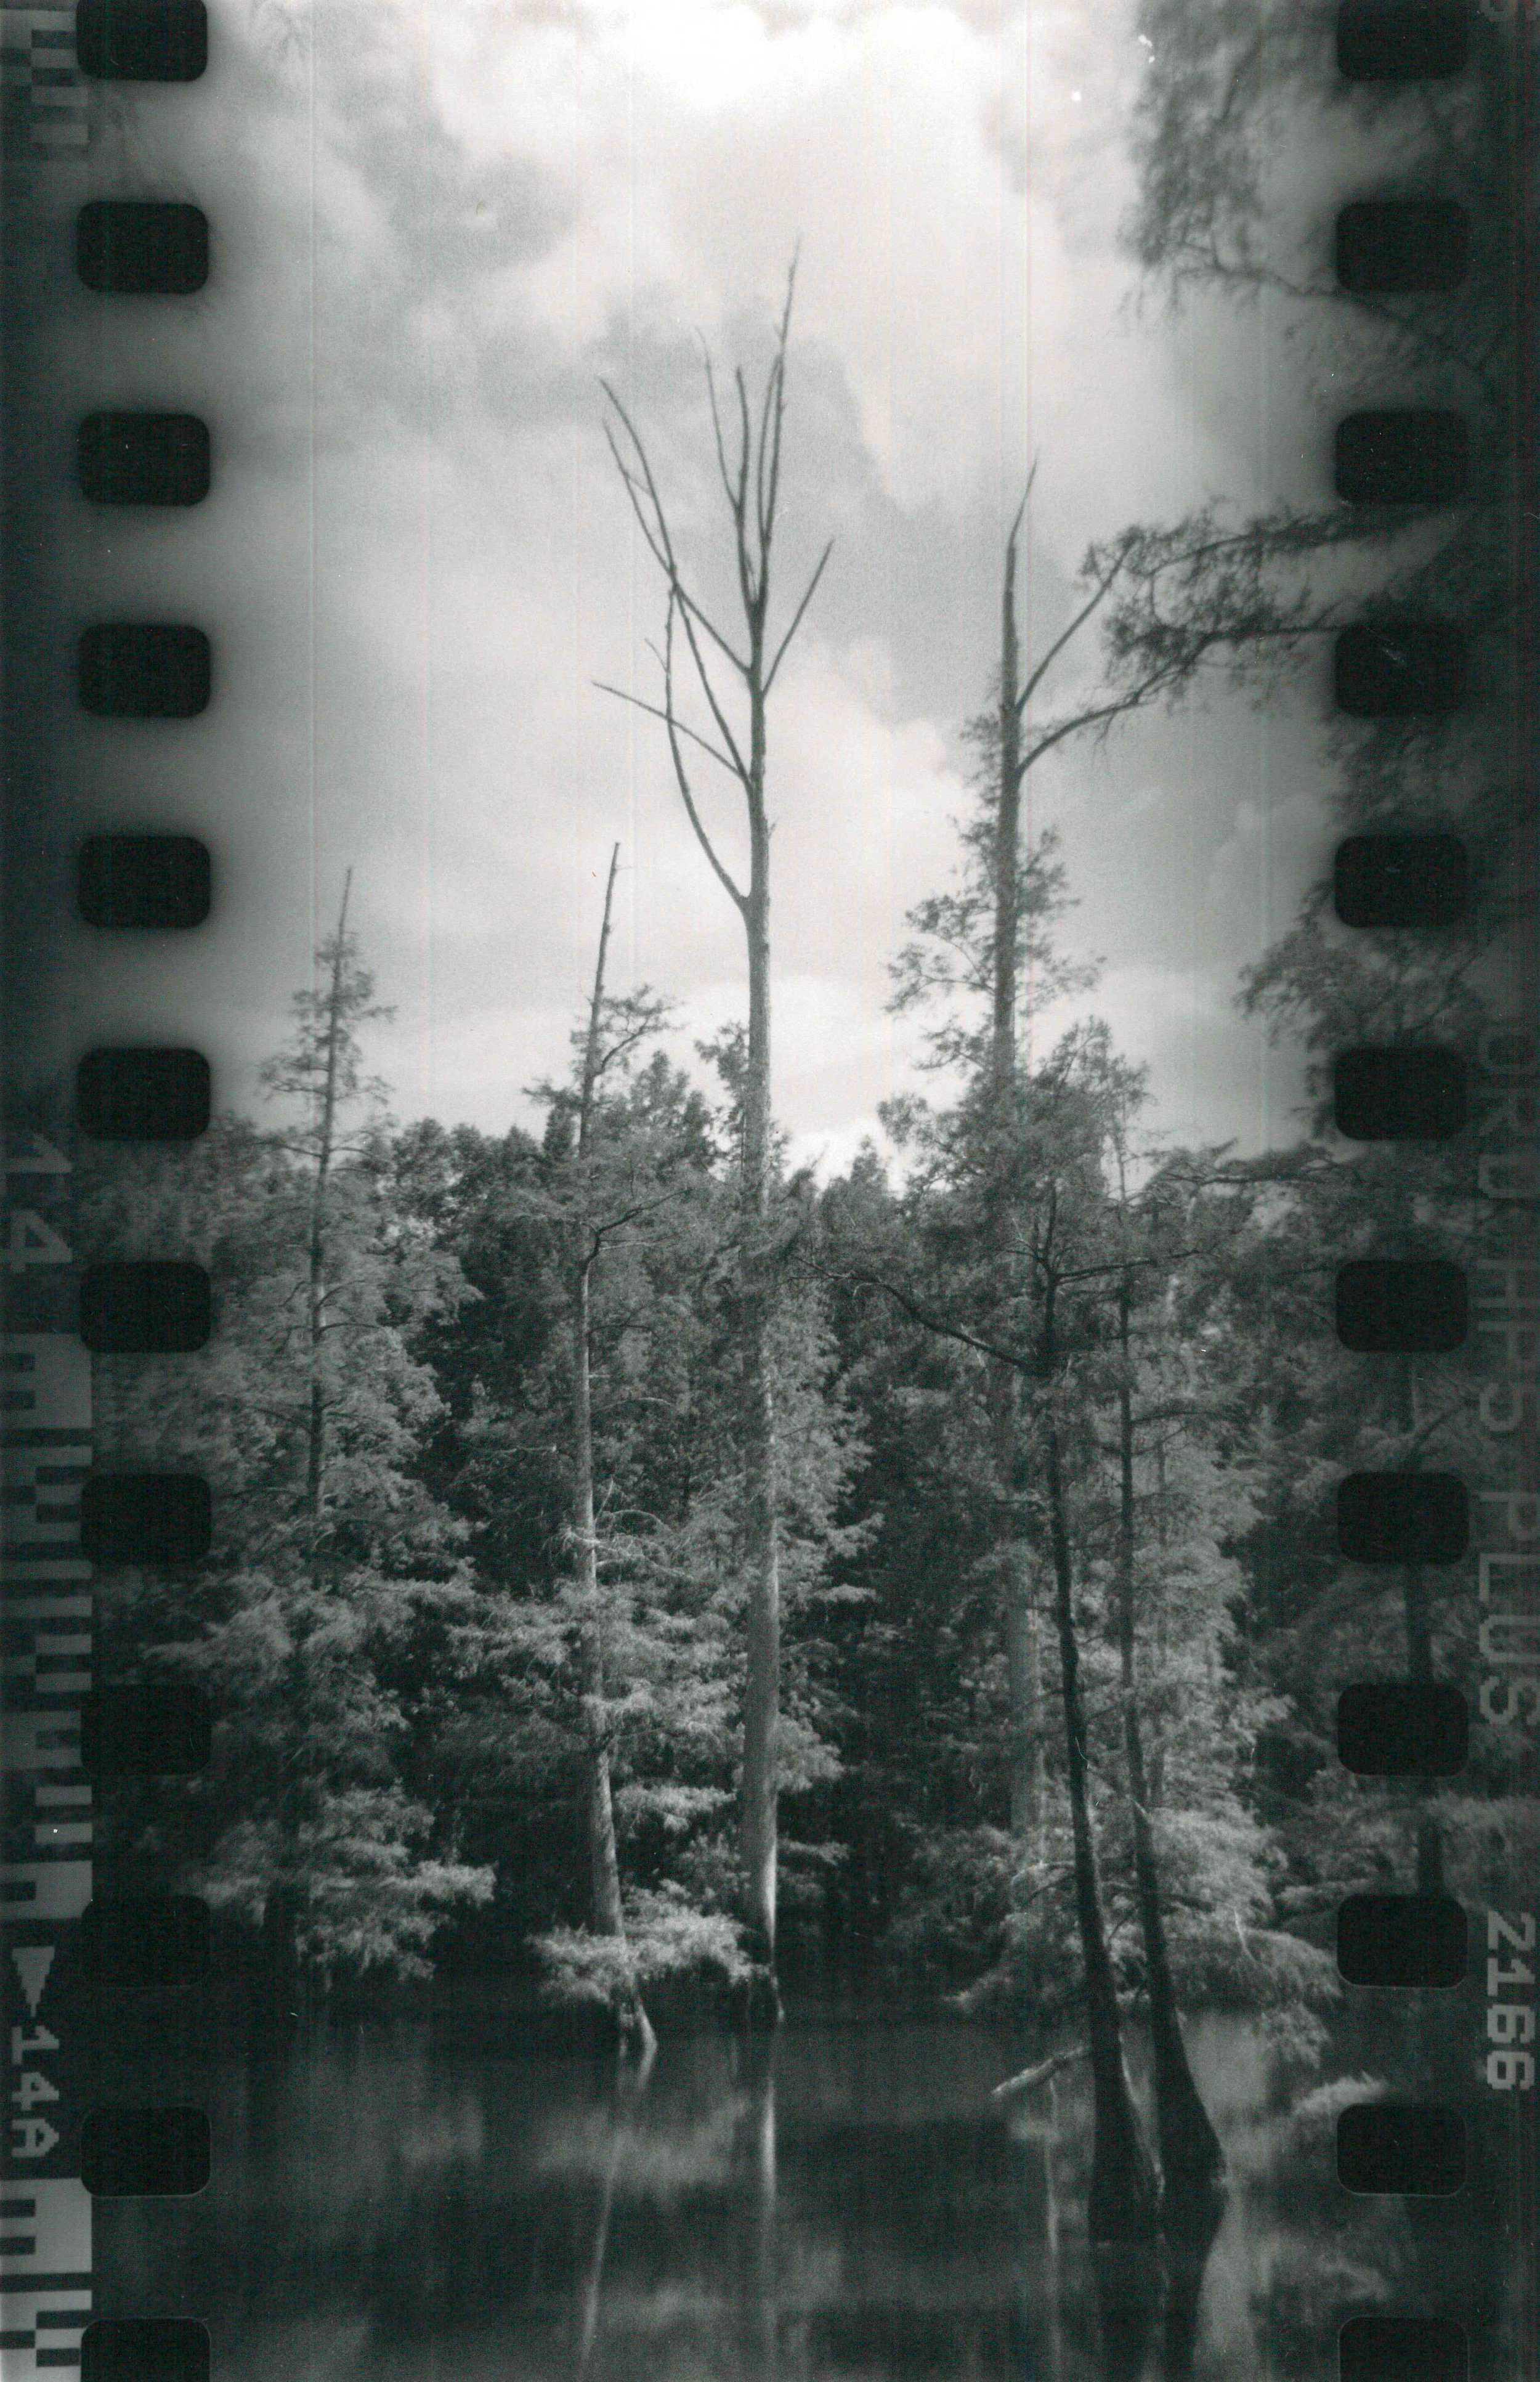 Ilford HP5 Plus film on Ilford silver gelatin paper